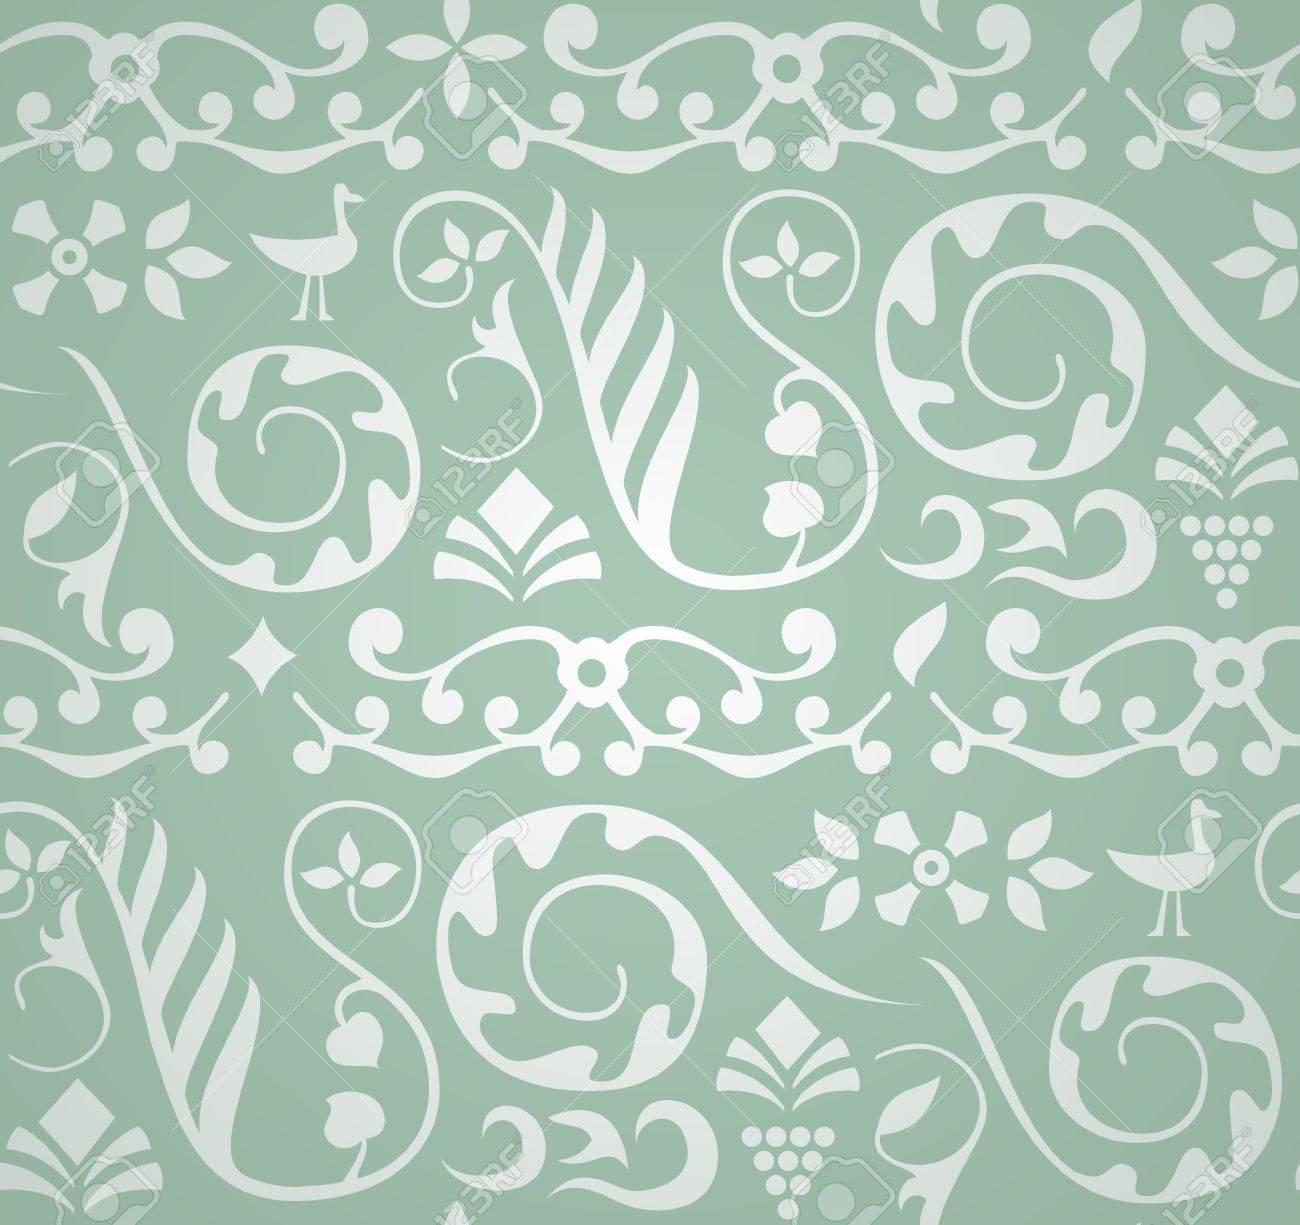 Decorative Pattern Stock Vector - 12473505